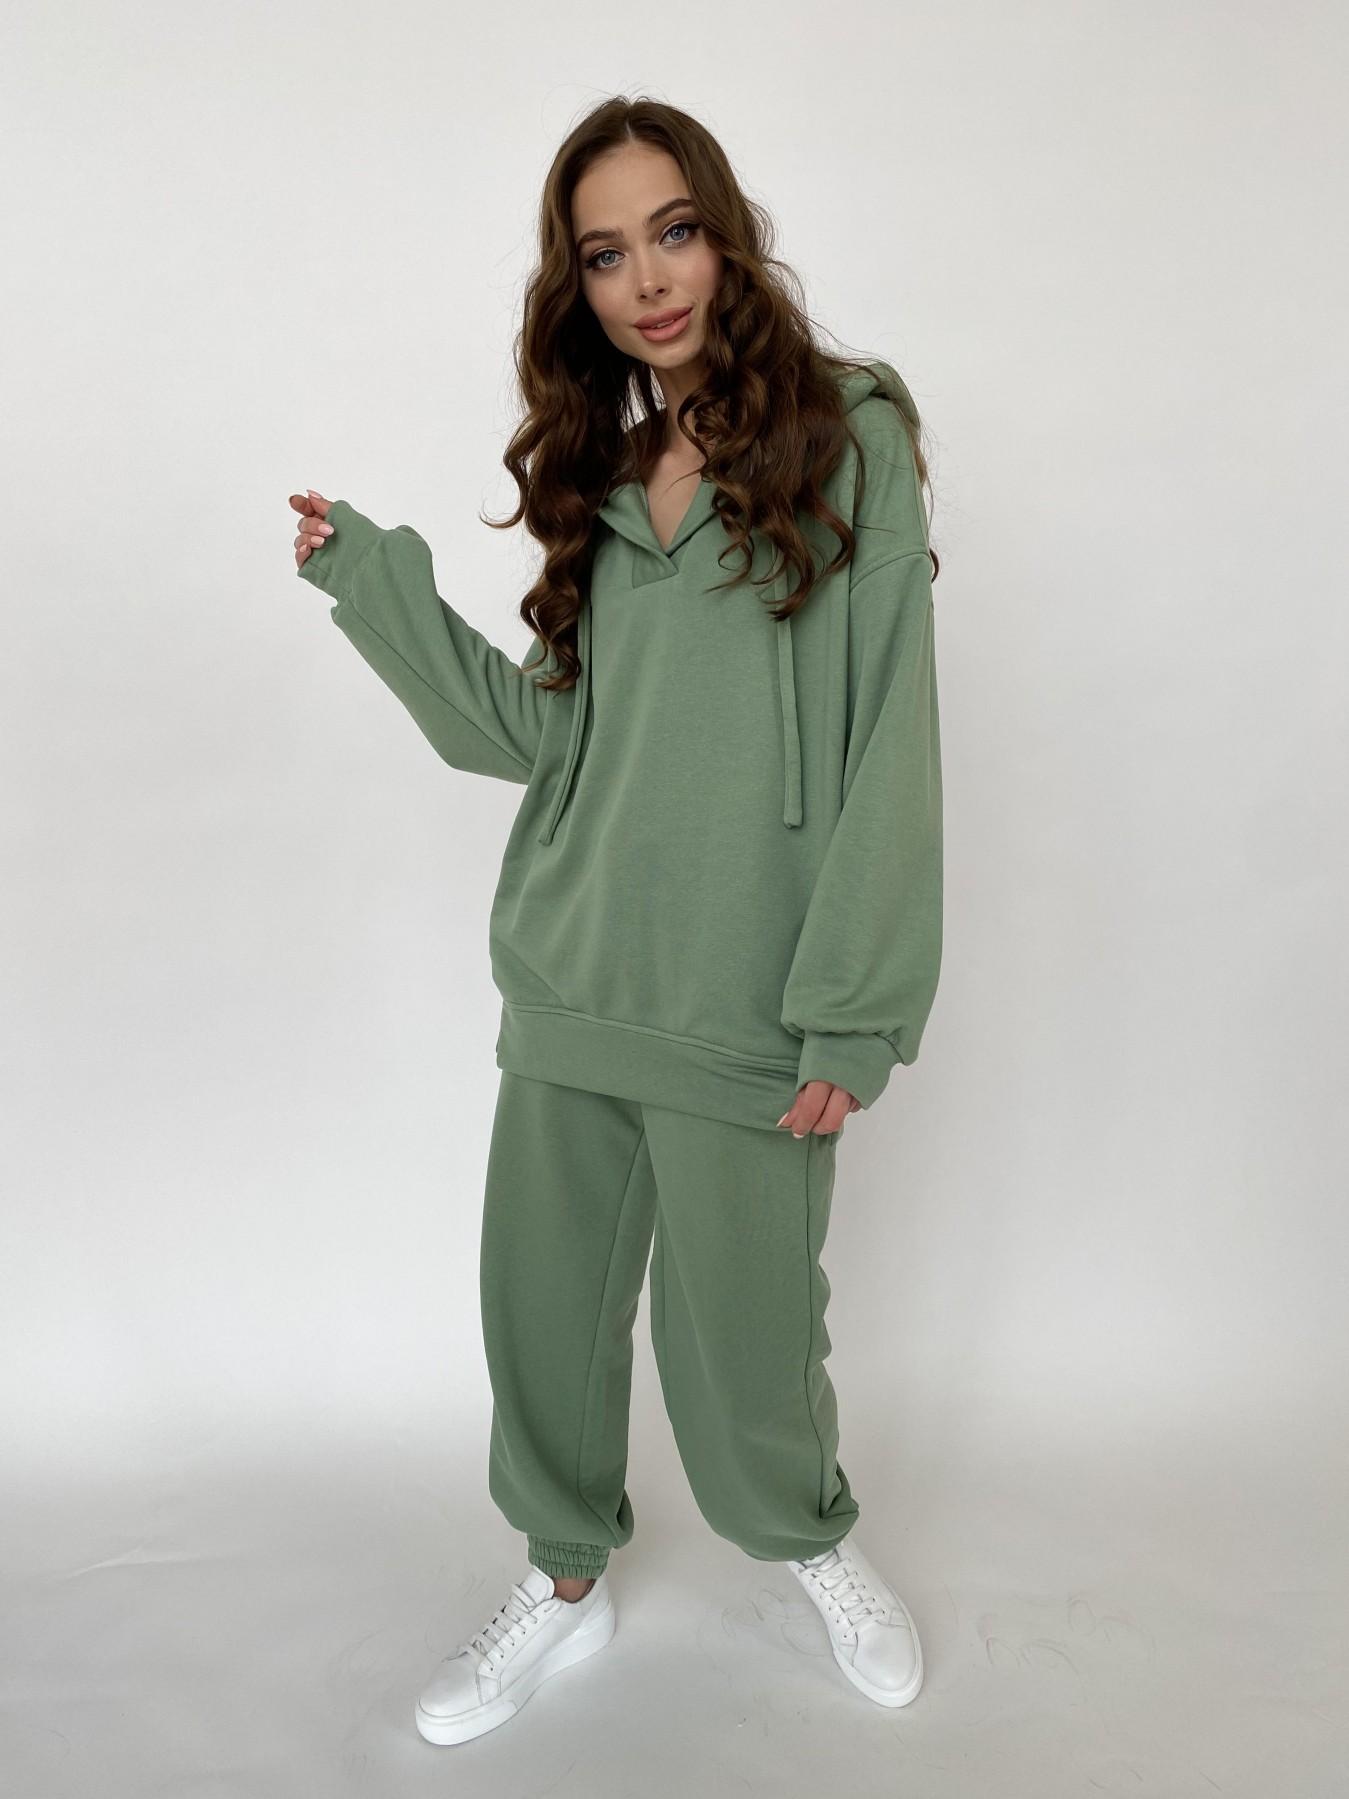 Ярис костюм из 3х нитки 10789 АРТ. 47617 Цвет: Олива Темная - фото 4, интернет магазин tm-modus.ru